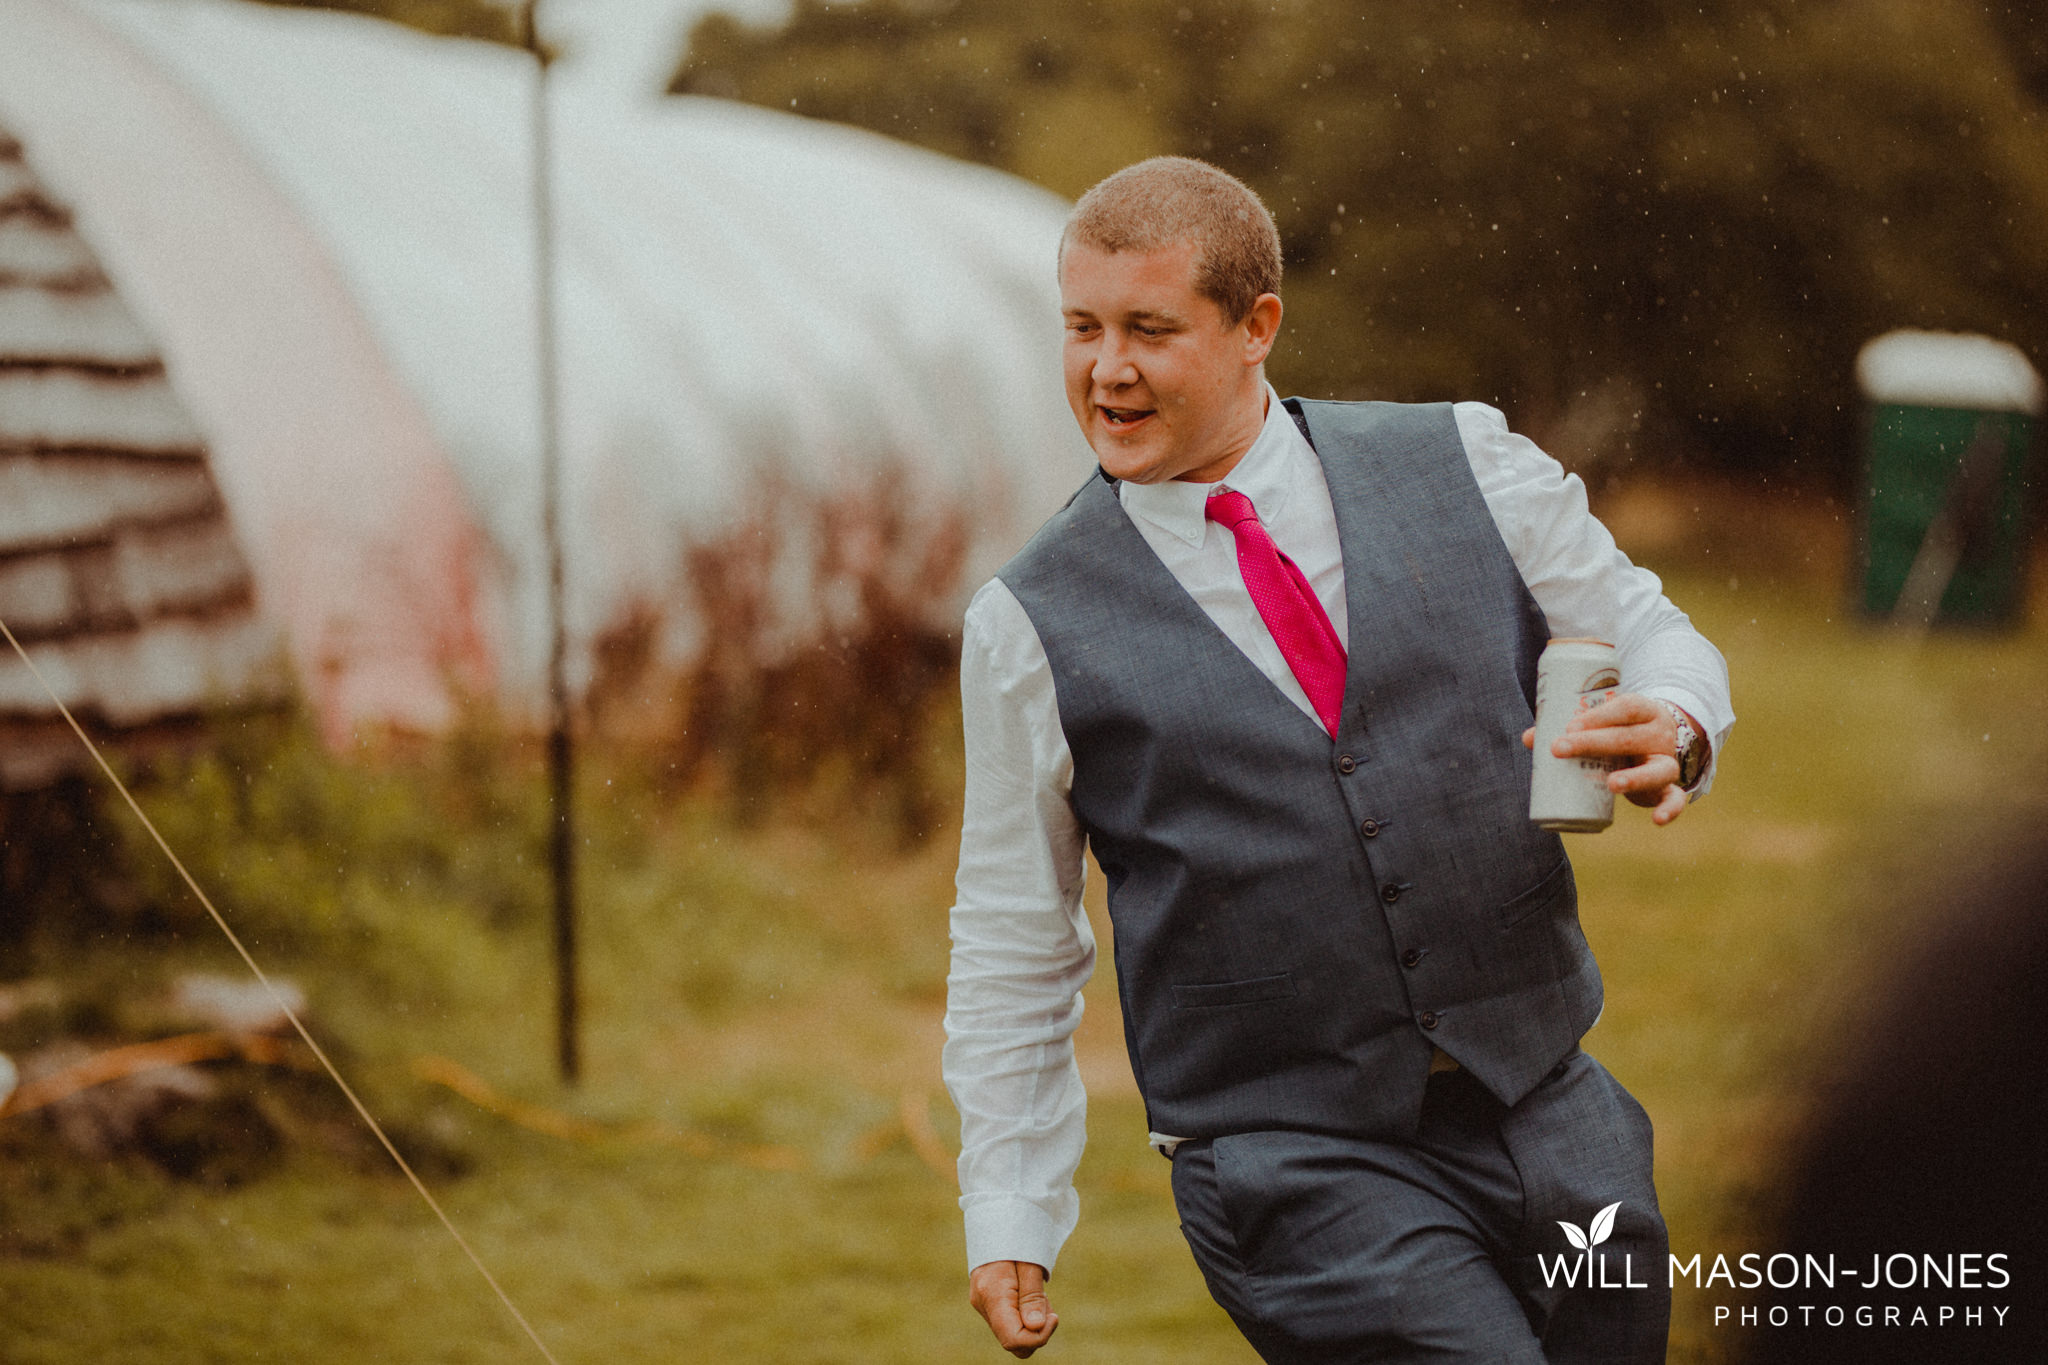 outdoor-wet-rainy-wedding-uk-swansea-photography-16.jpg